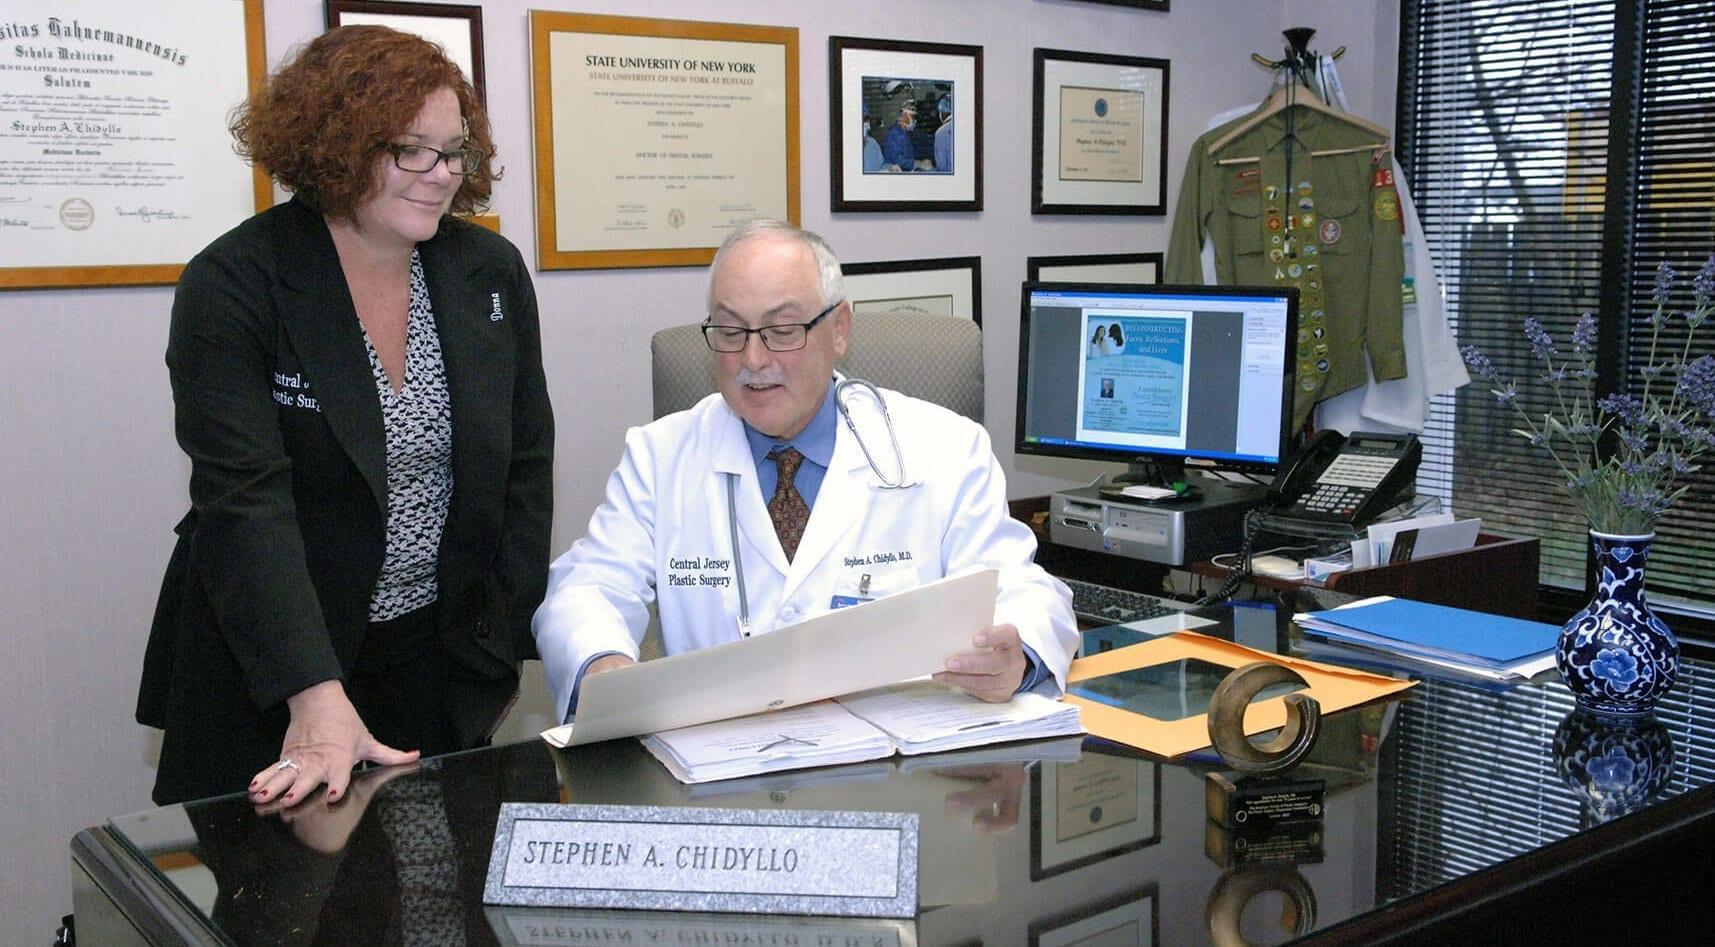 Dr. Stephen Chidyllo, Plastic Surgeon